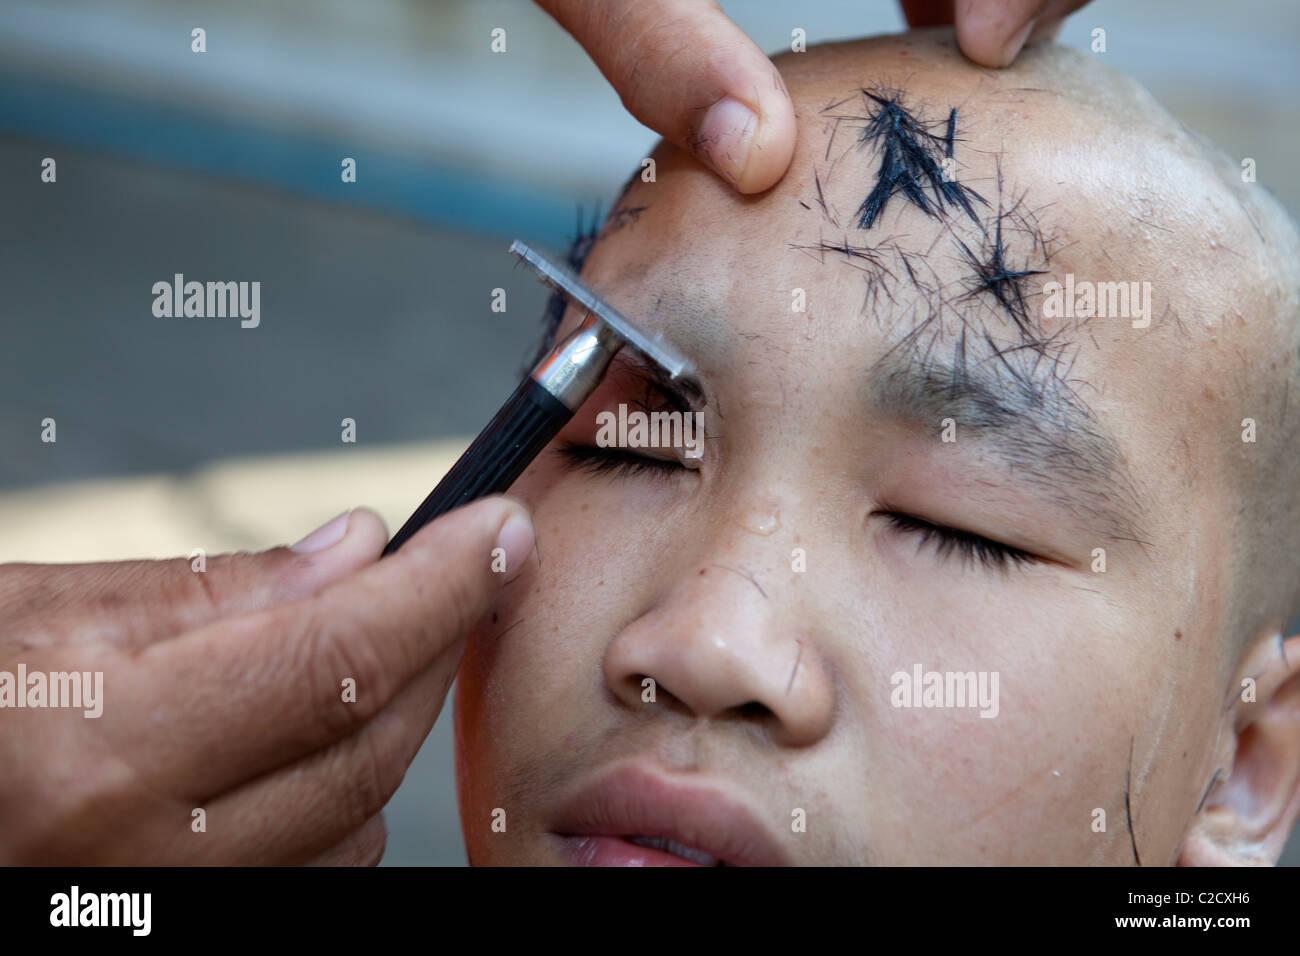 The Little Monk Saving Hair Its Follow Buddhas Teaching Stock